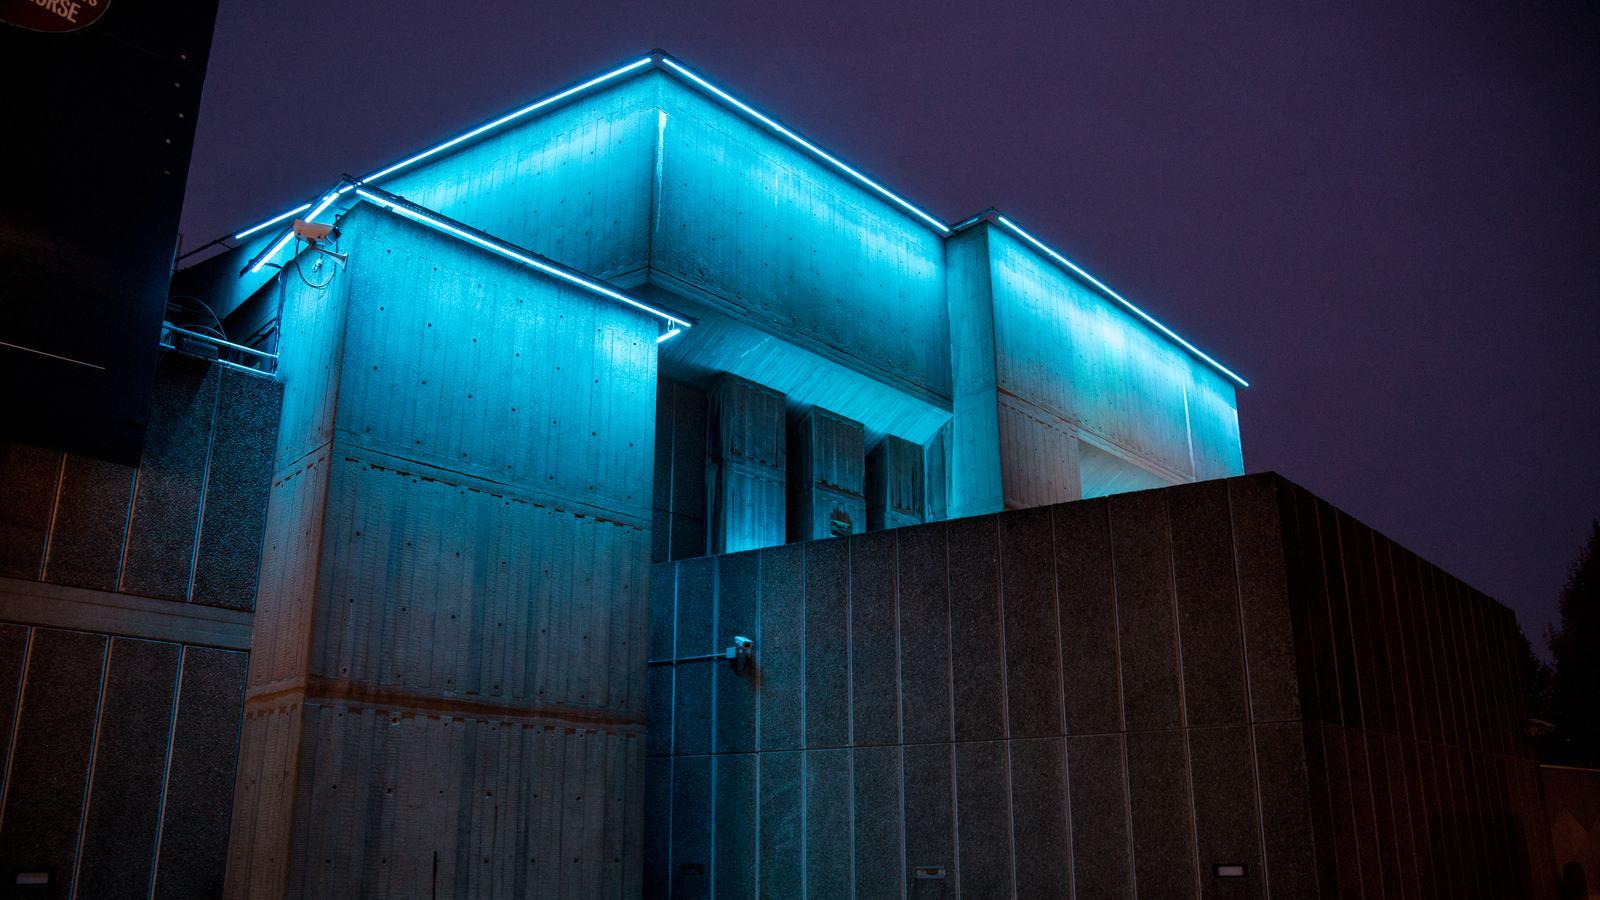 David Batchelor's Sixty Minute Spectrum Redux installation illuminates the Southbank Centre at night